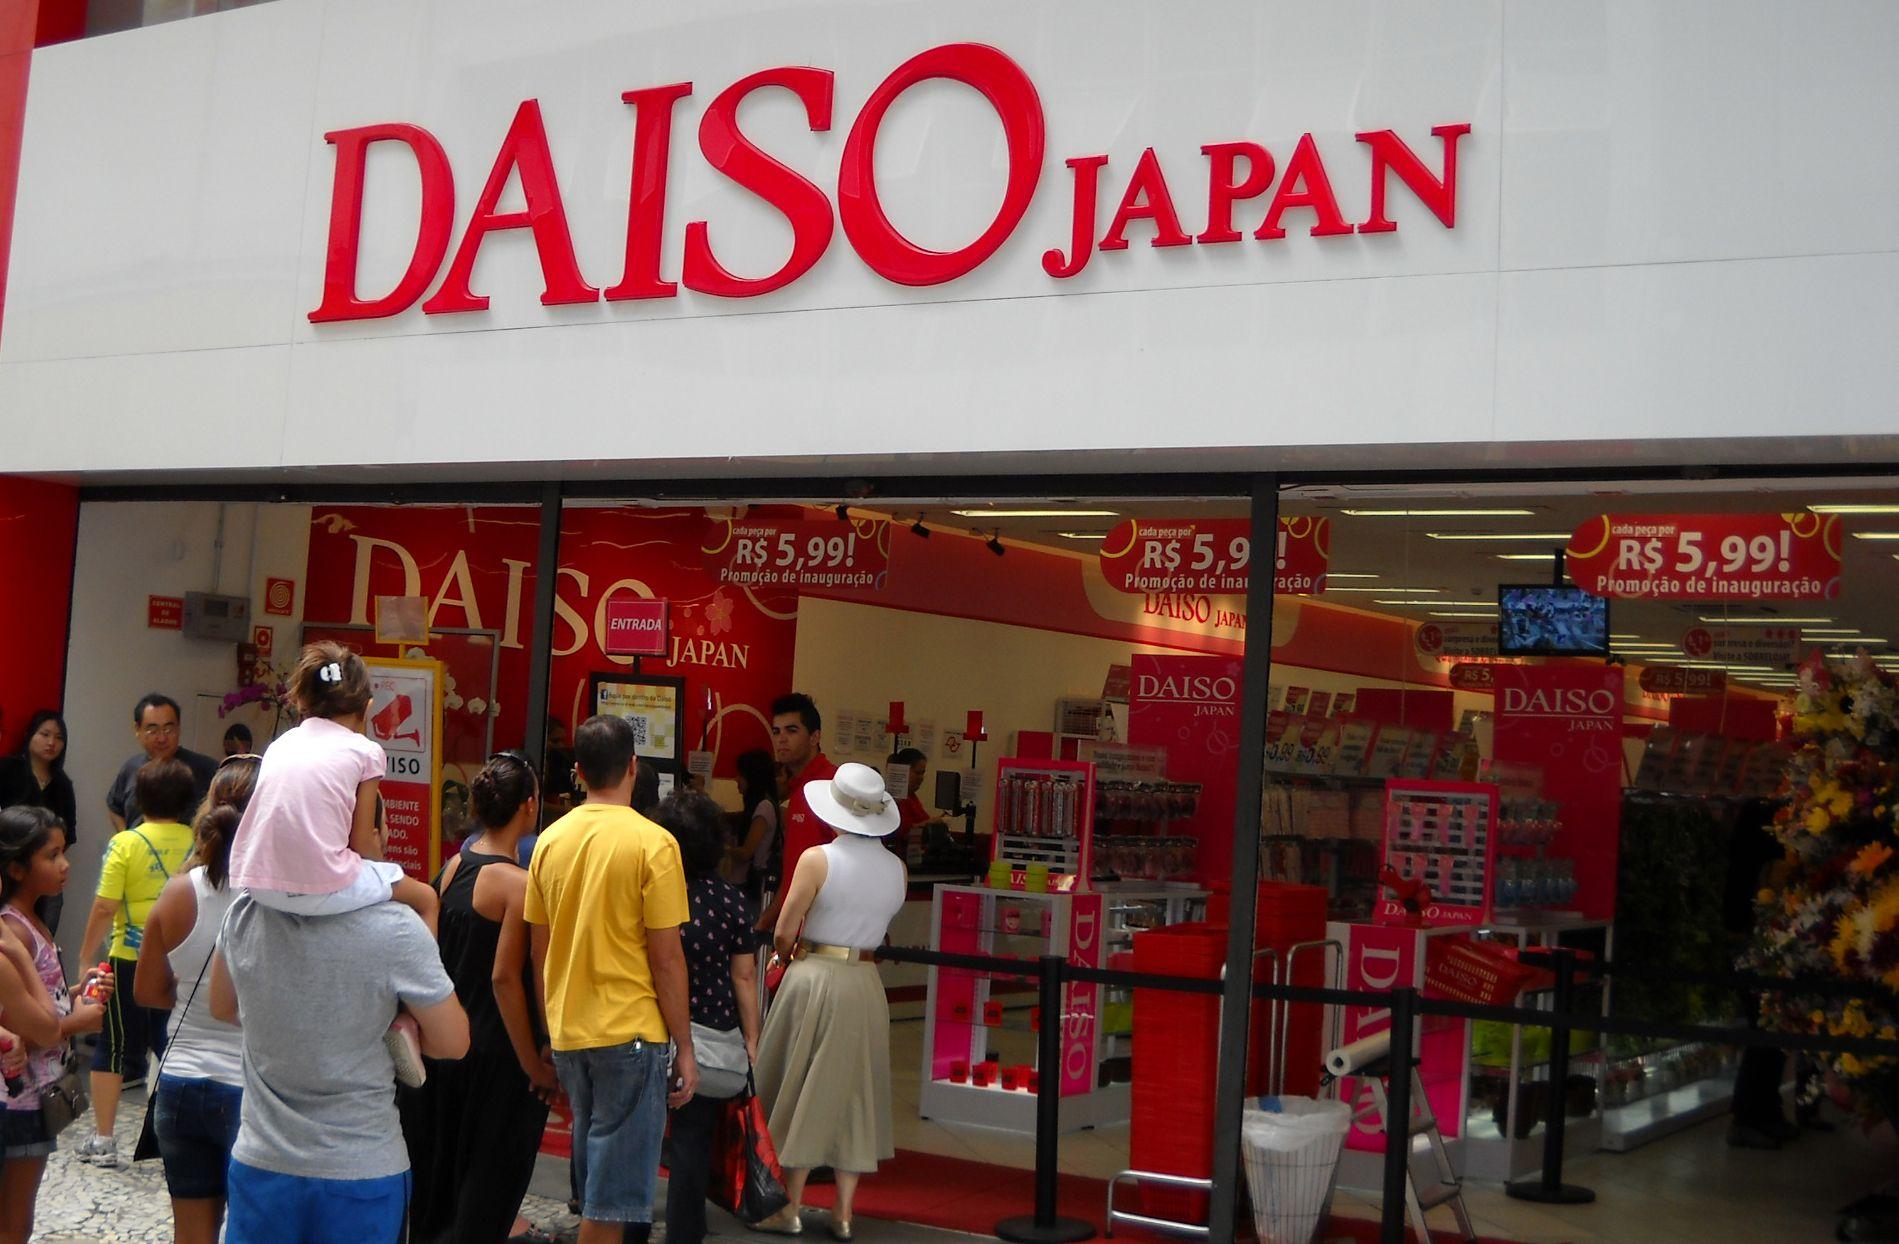 eb75bbe3a5316 daiso-japan-loja-liberdade-sao-paulo-compras-achados